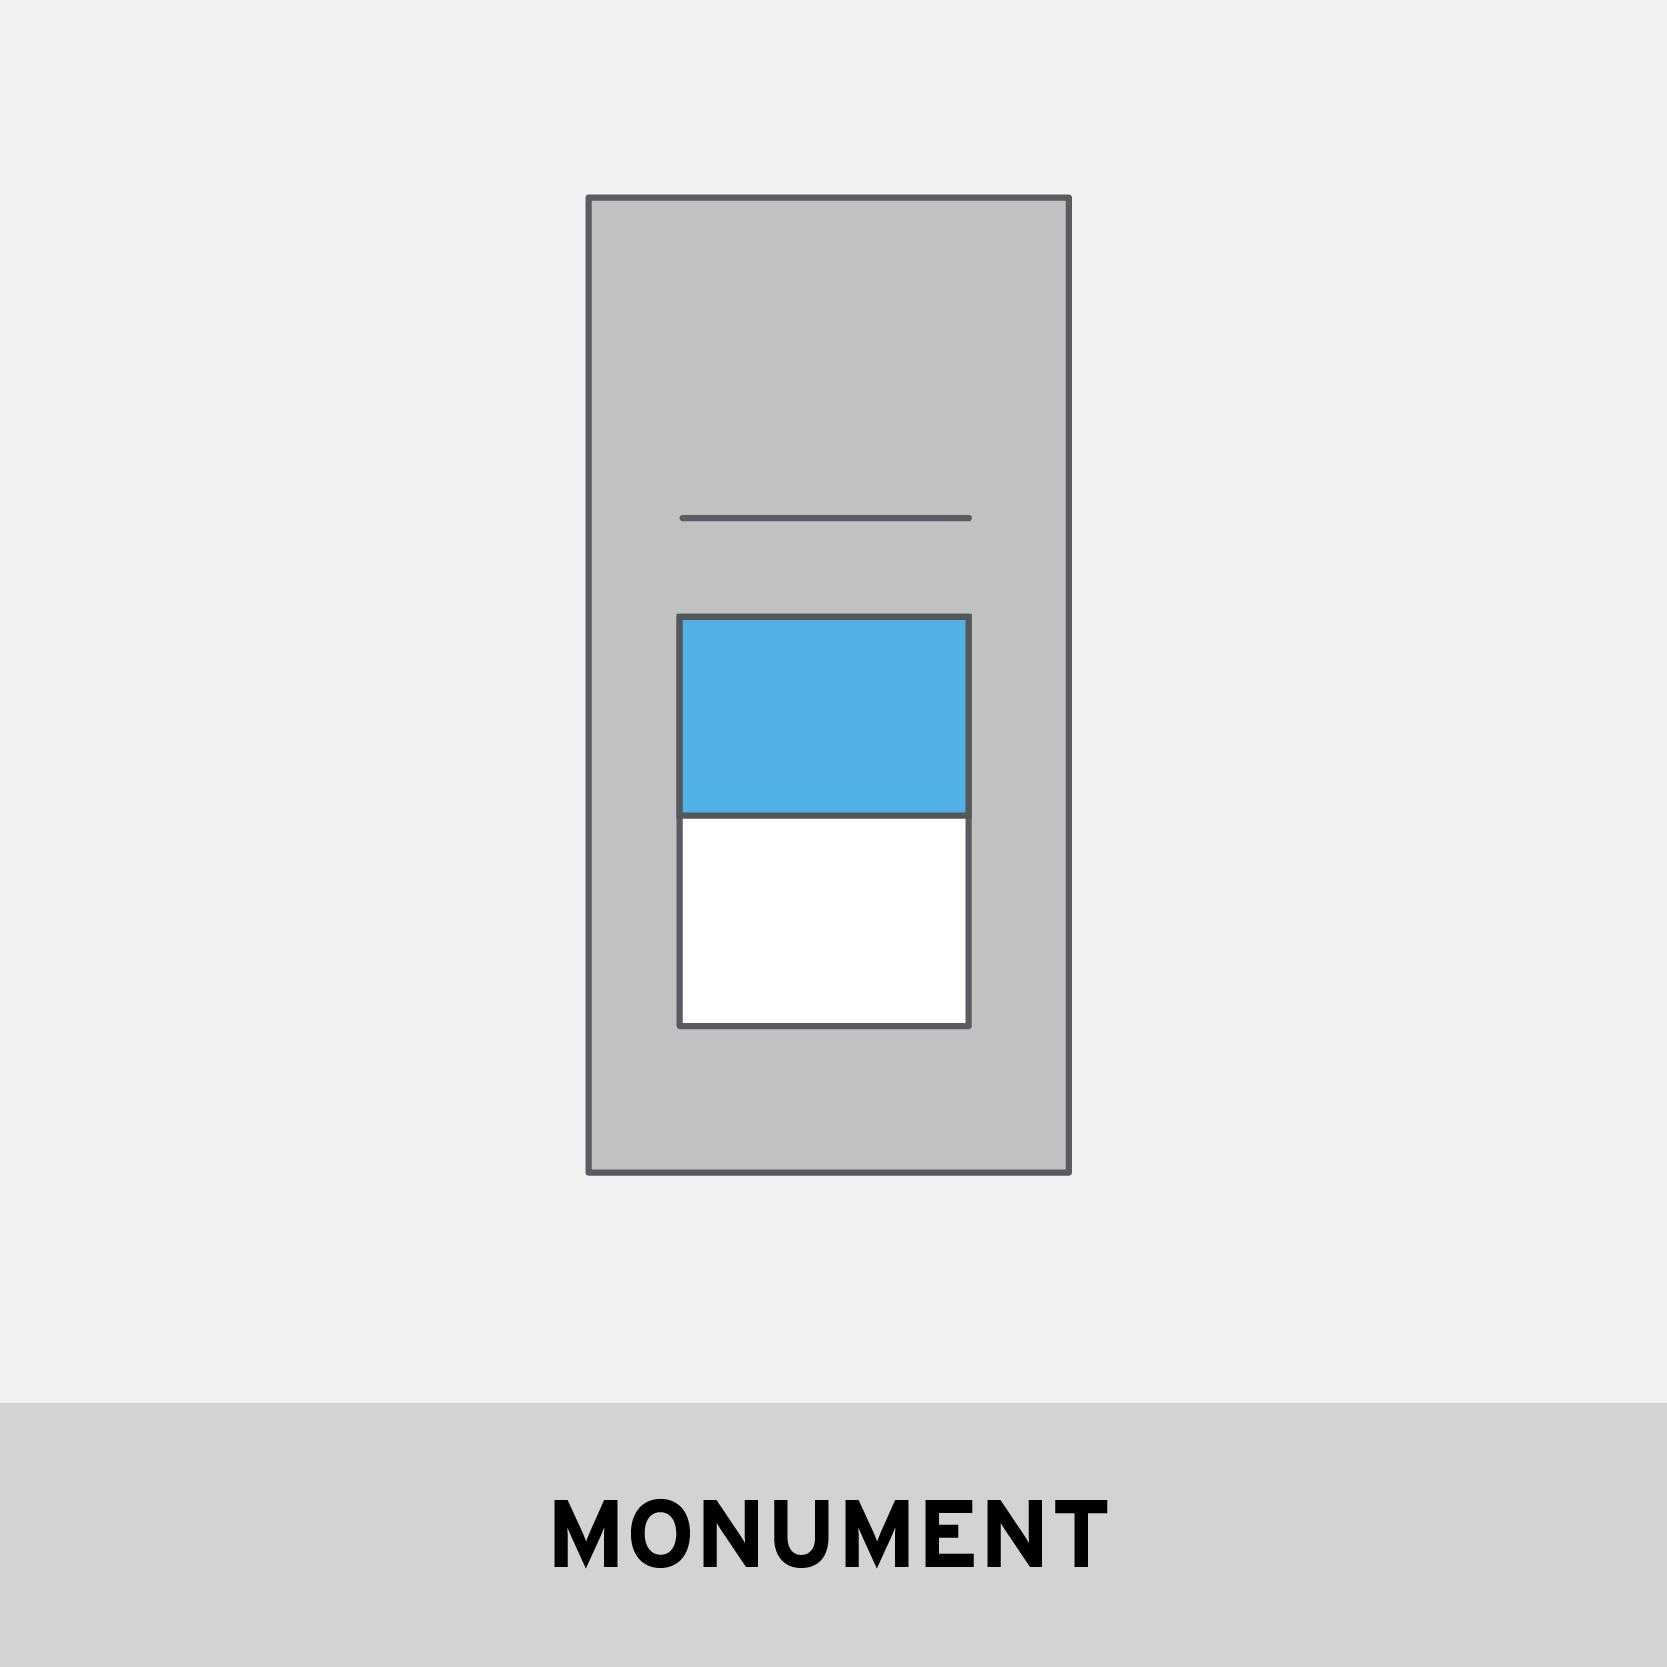 MONUMENT PARAMETERS